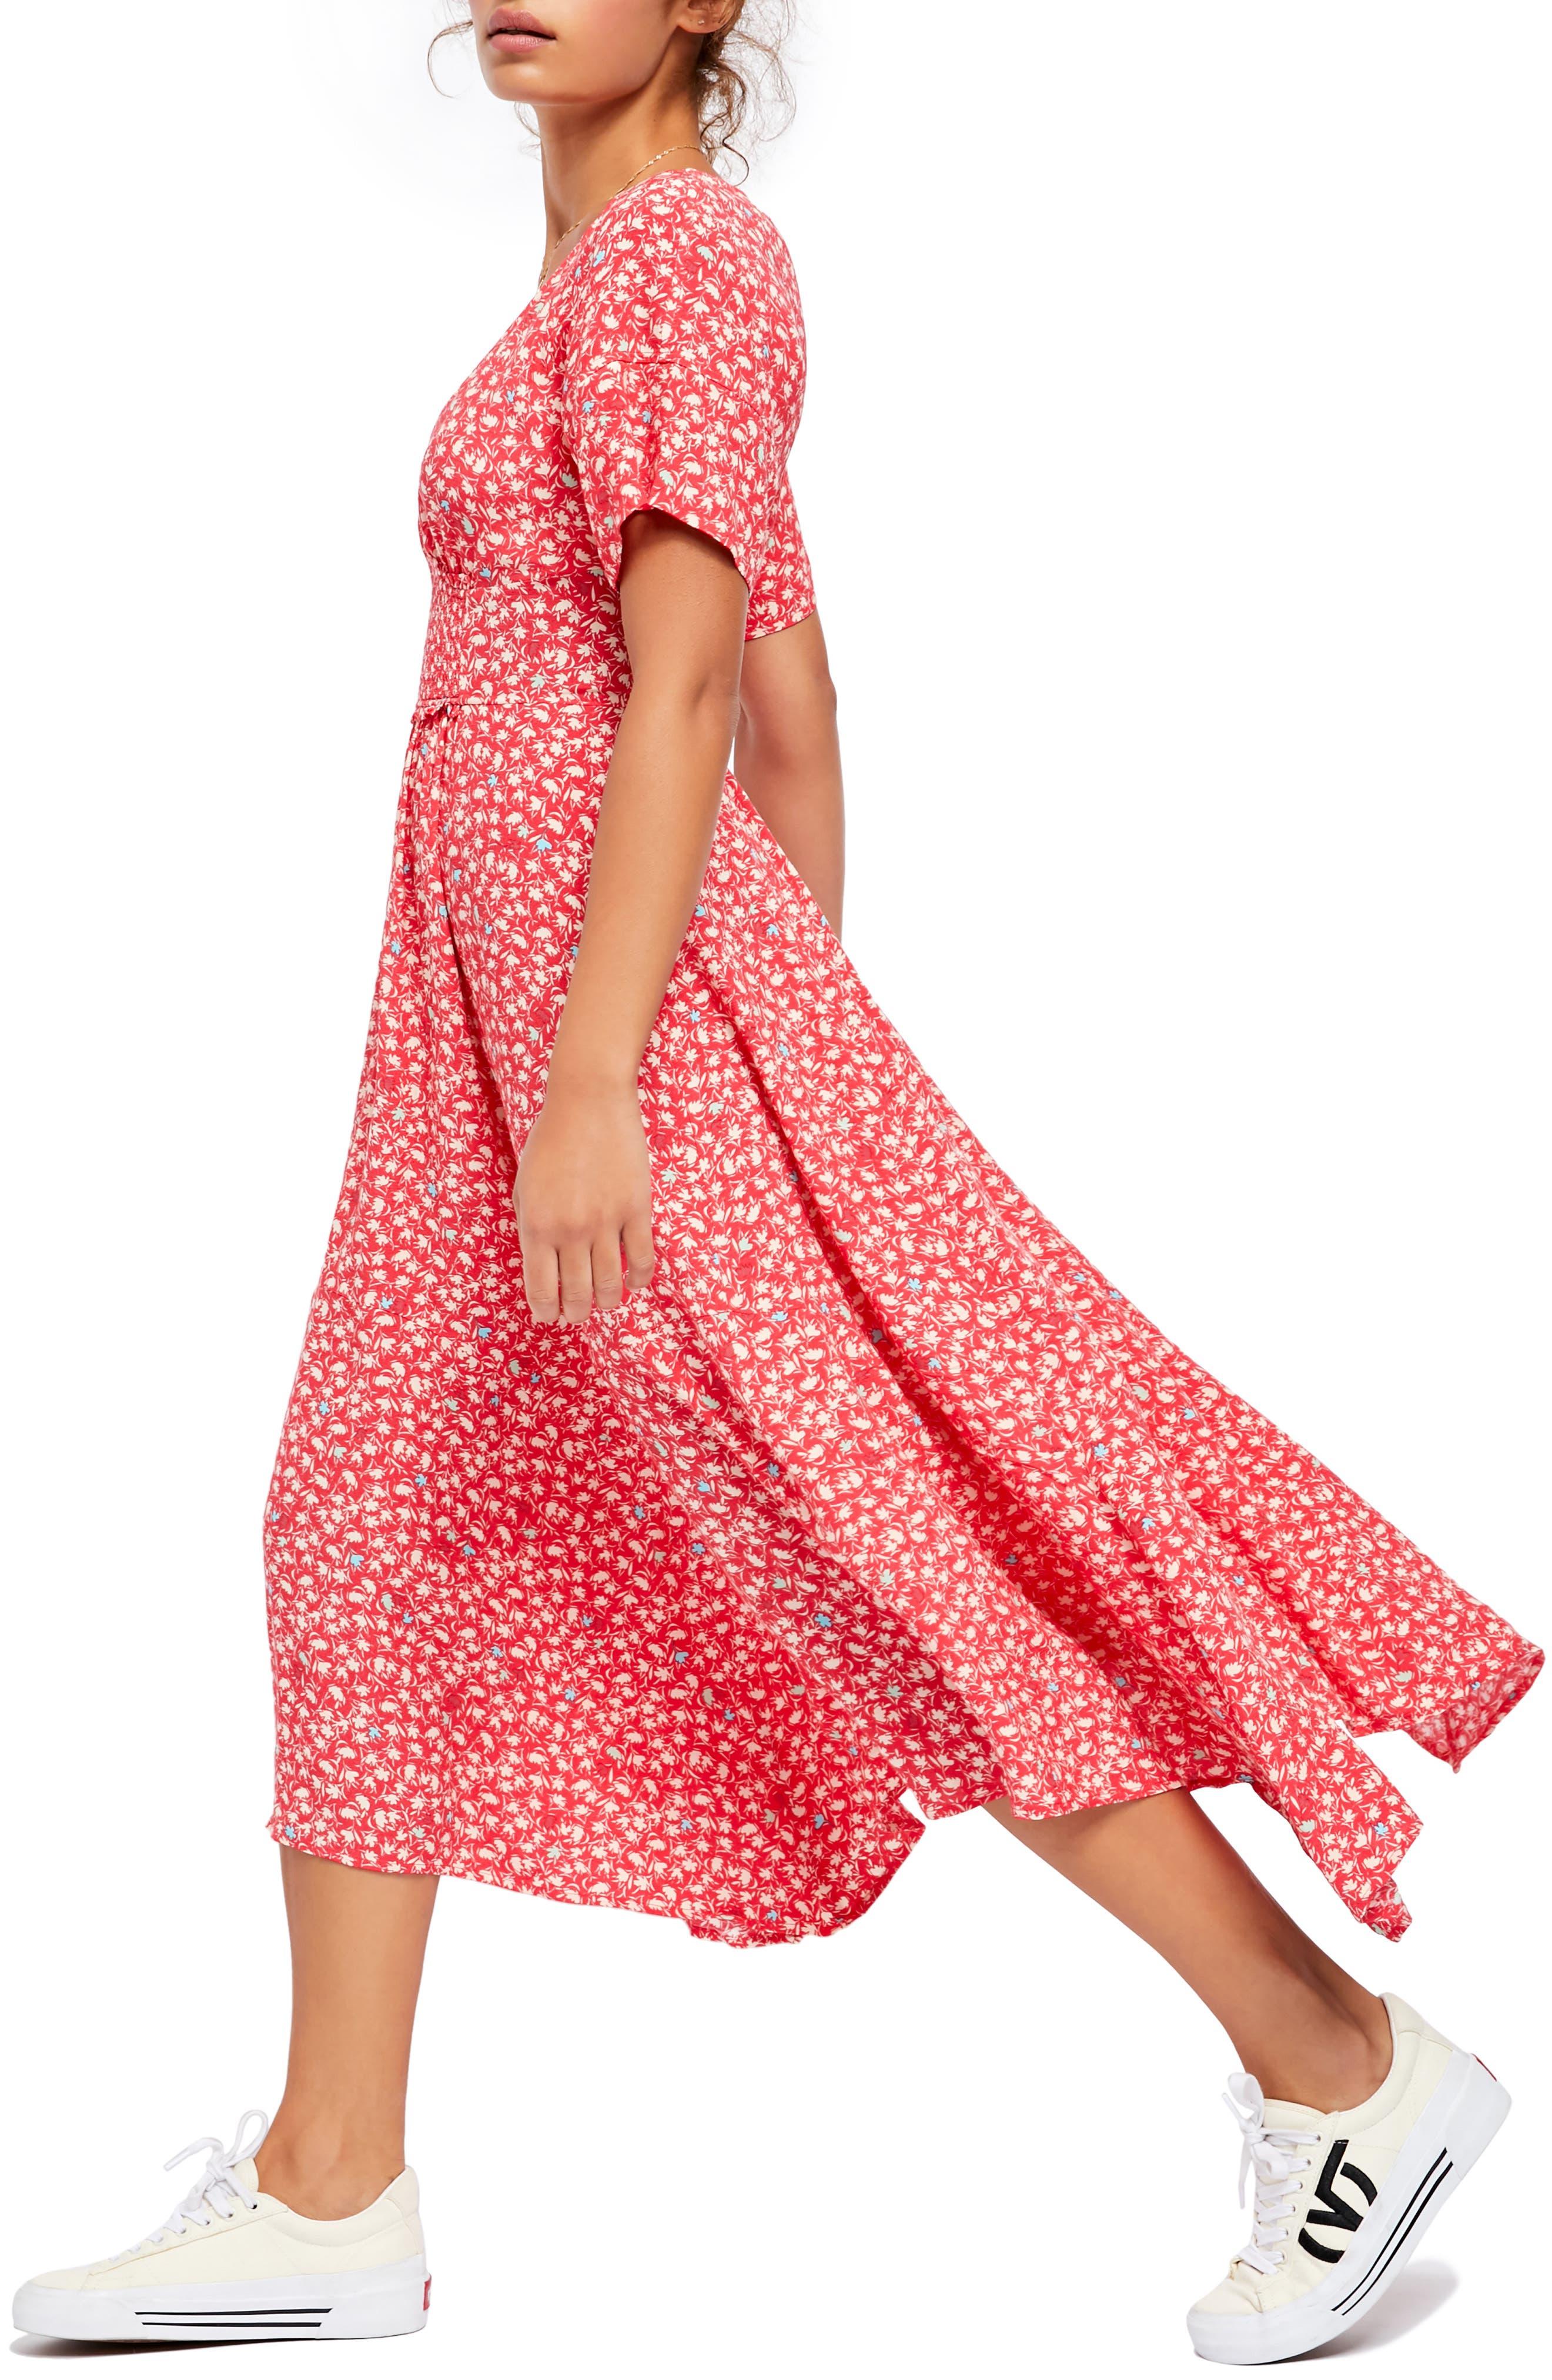 Plus Size Striped Mesh and Eyelash Lace Bra Set | Womens